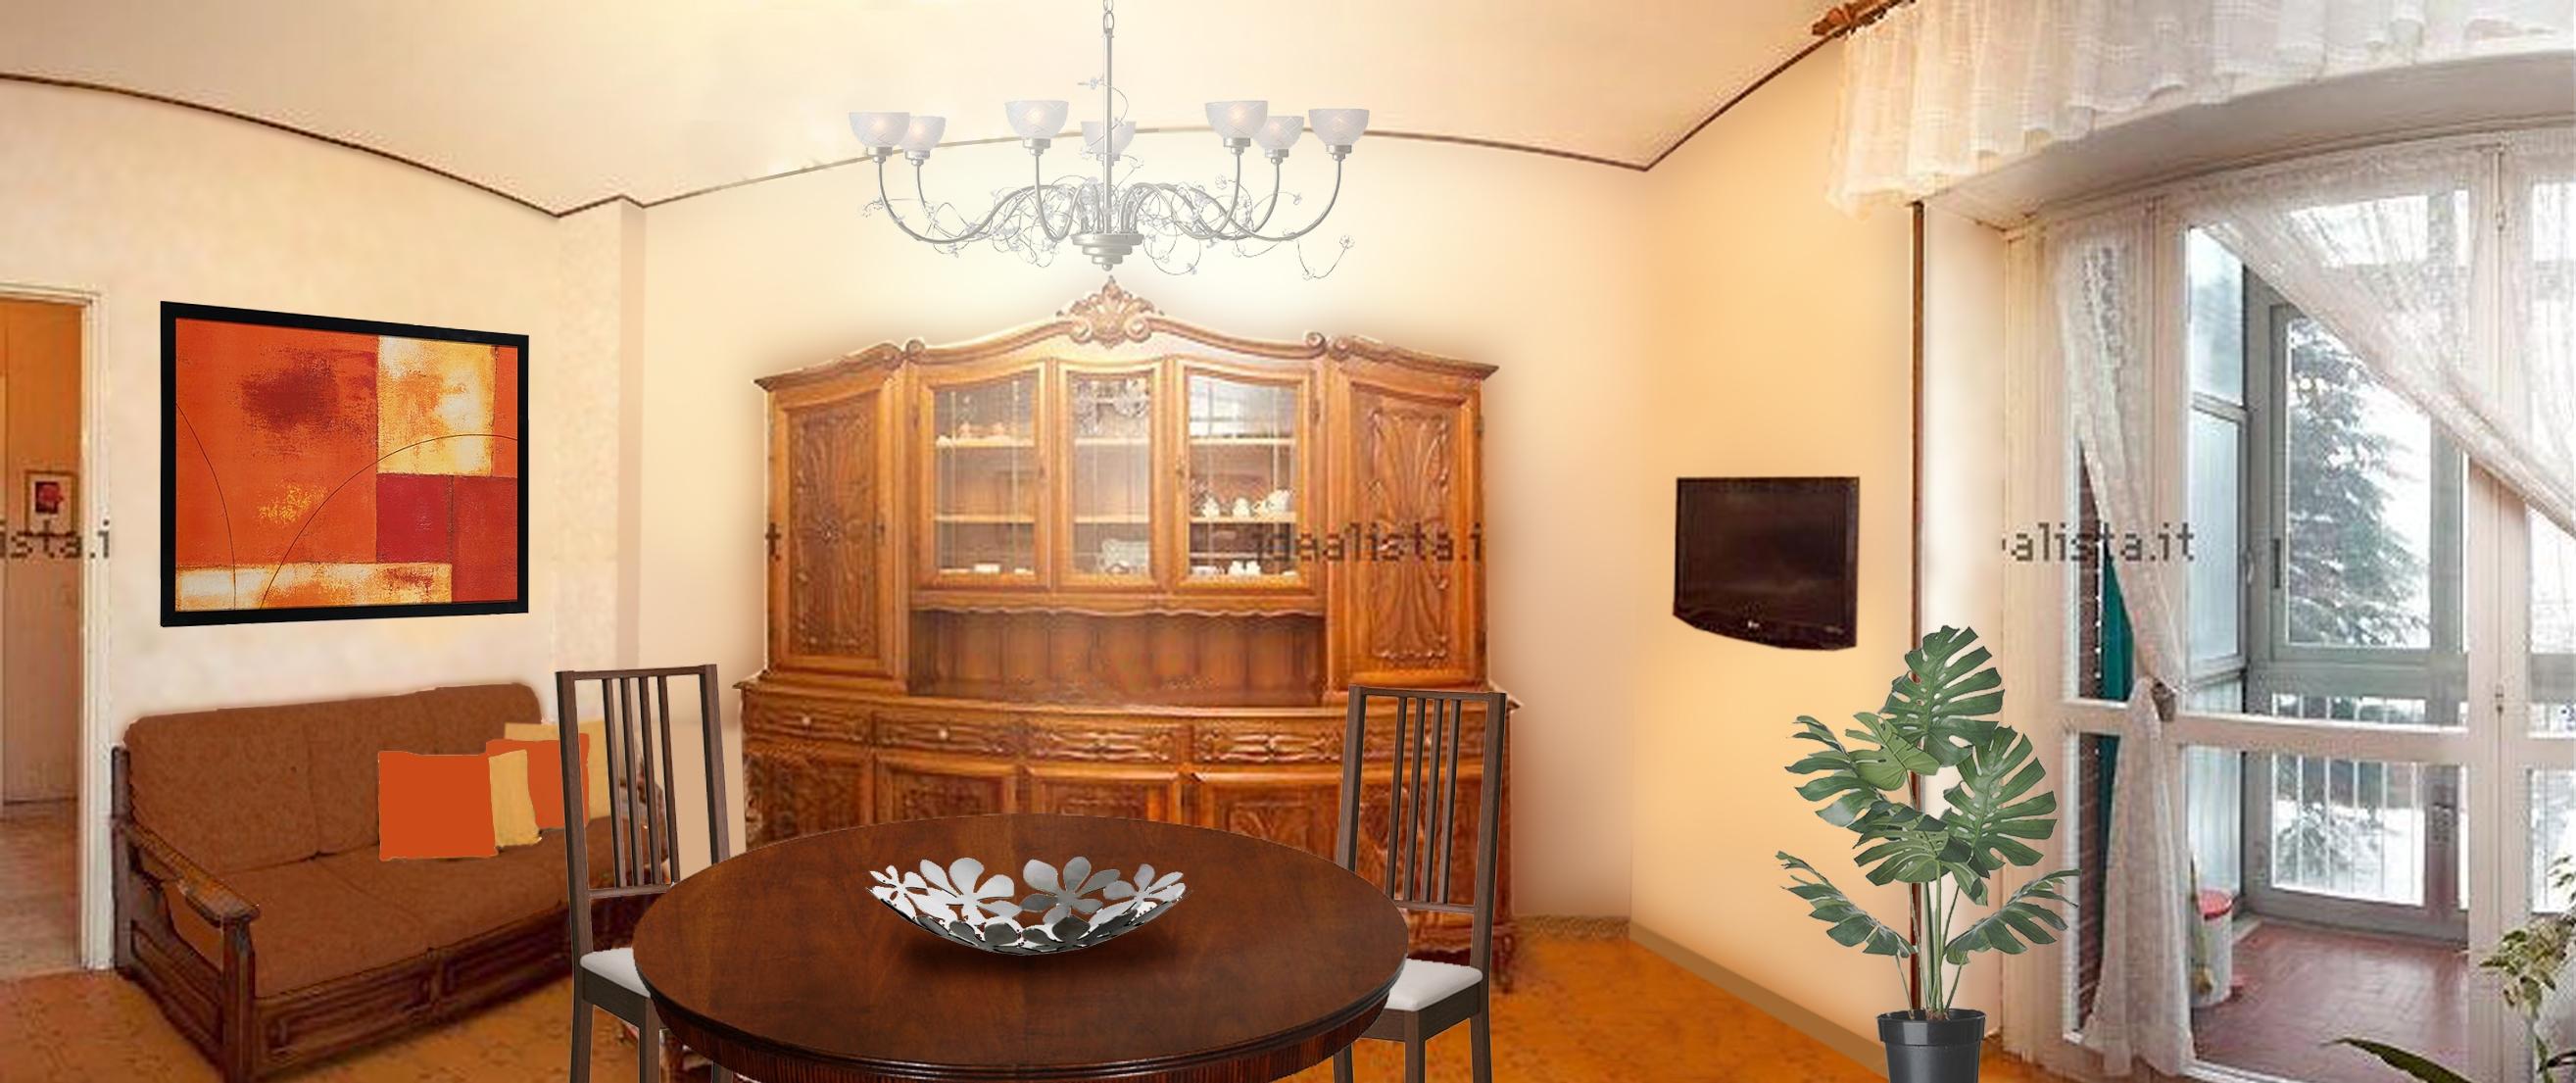 Tinteggiare casa esterno colori wq46 regardsdefemmes for Pareti salone